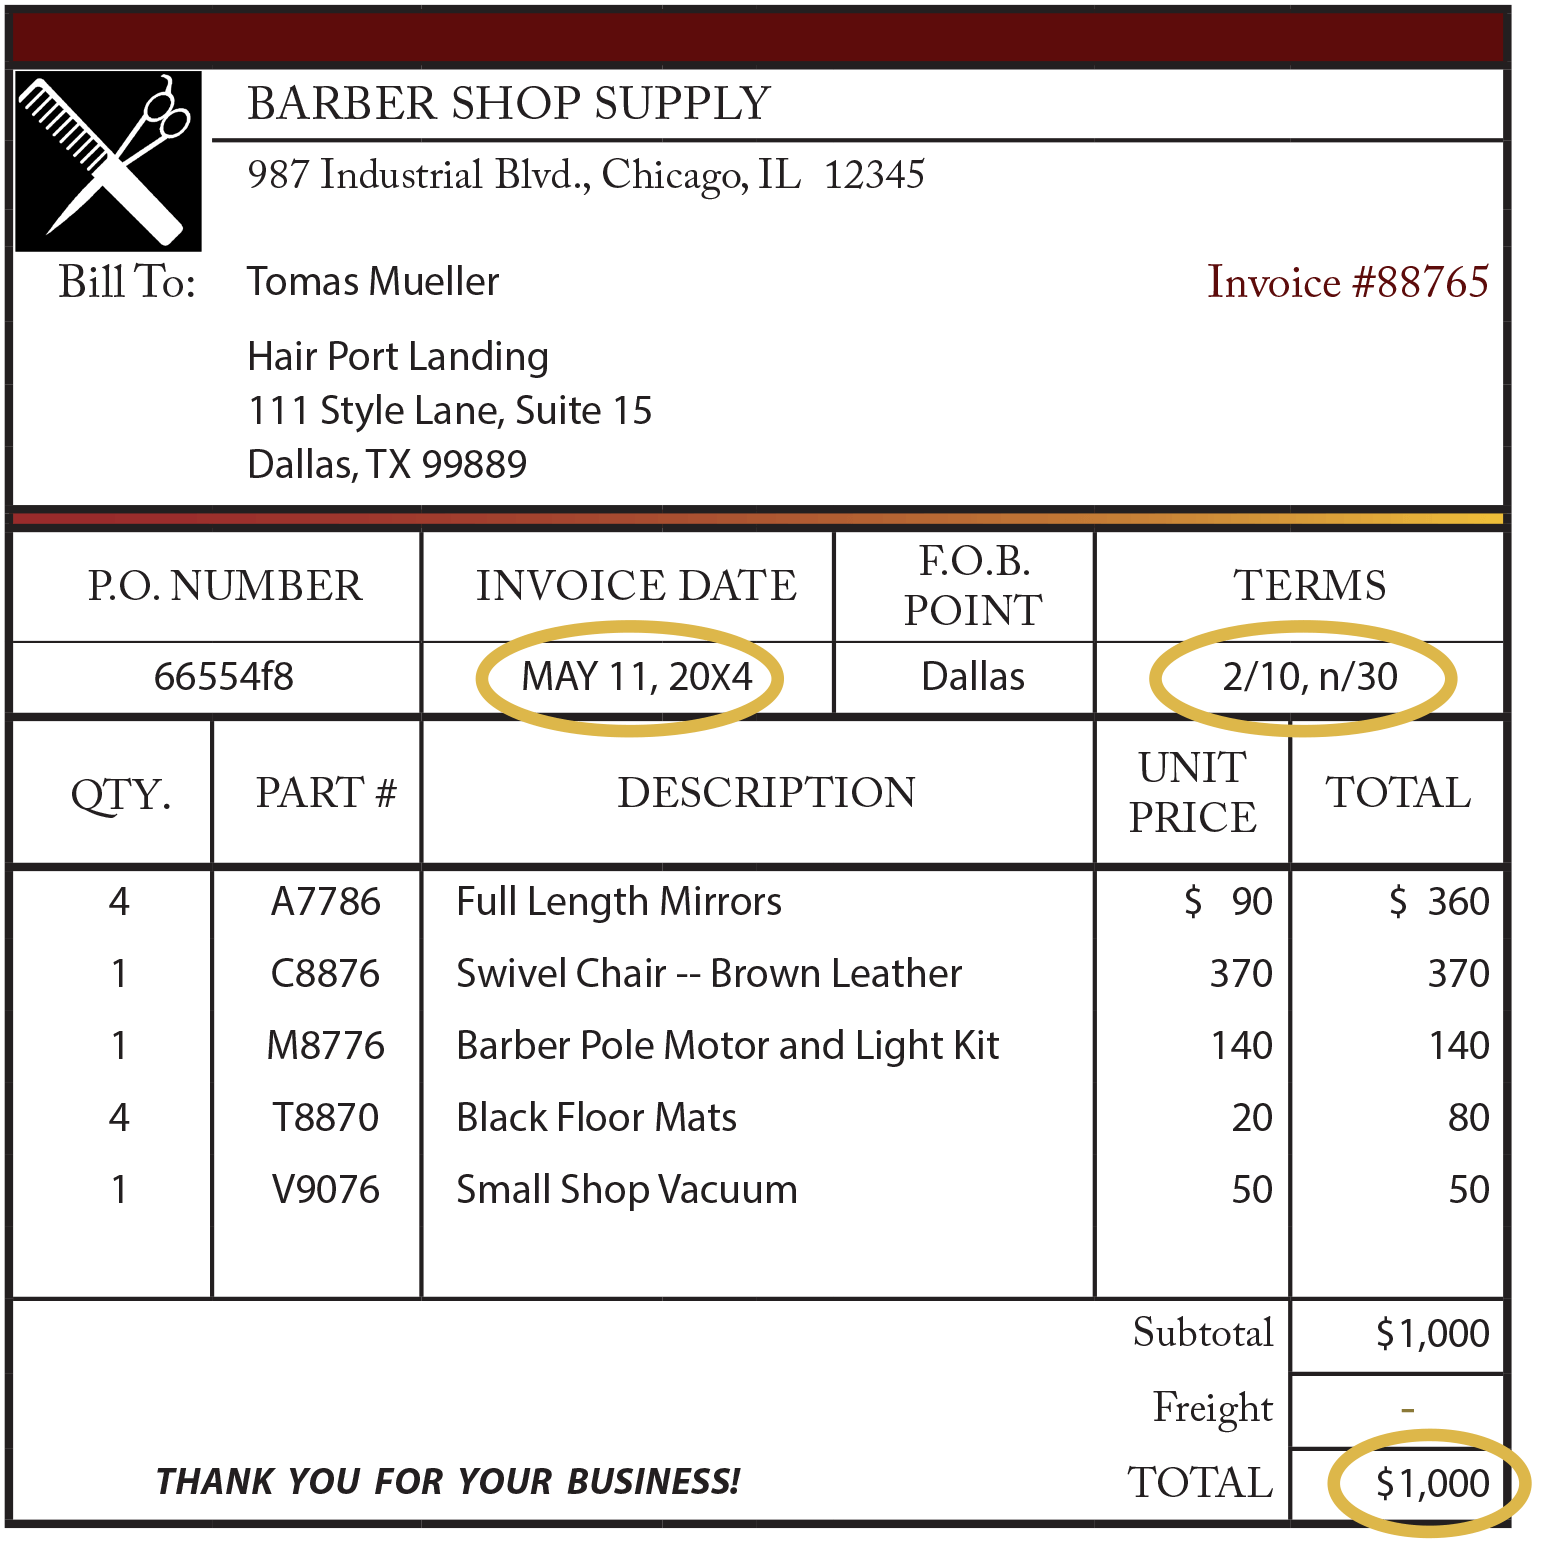 Invoice receipt template